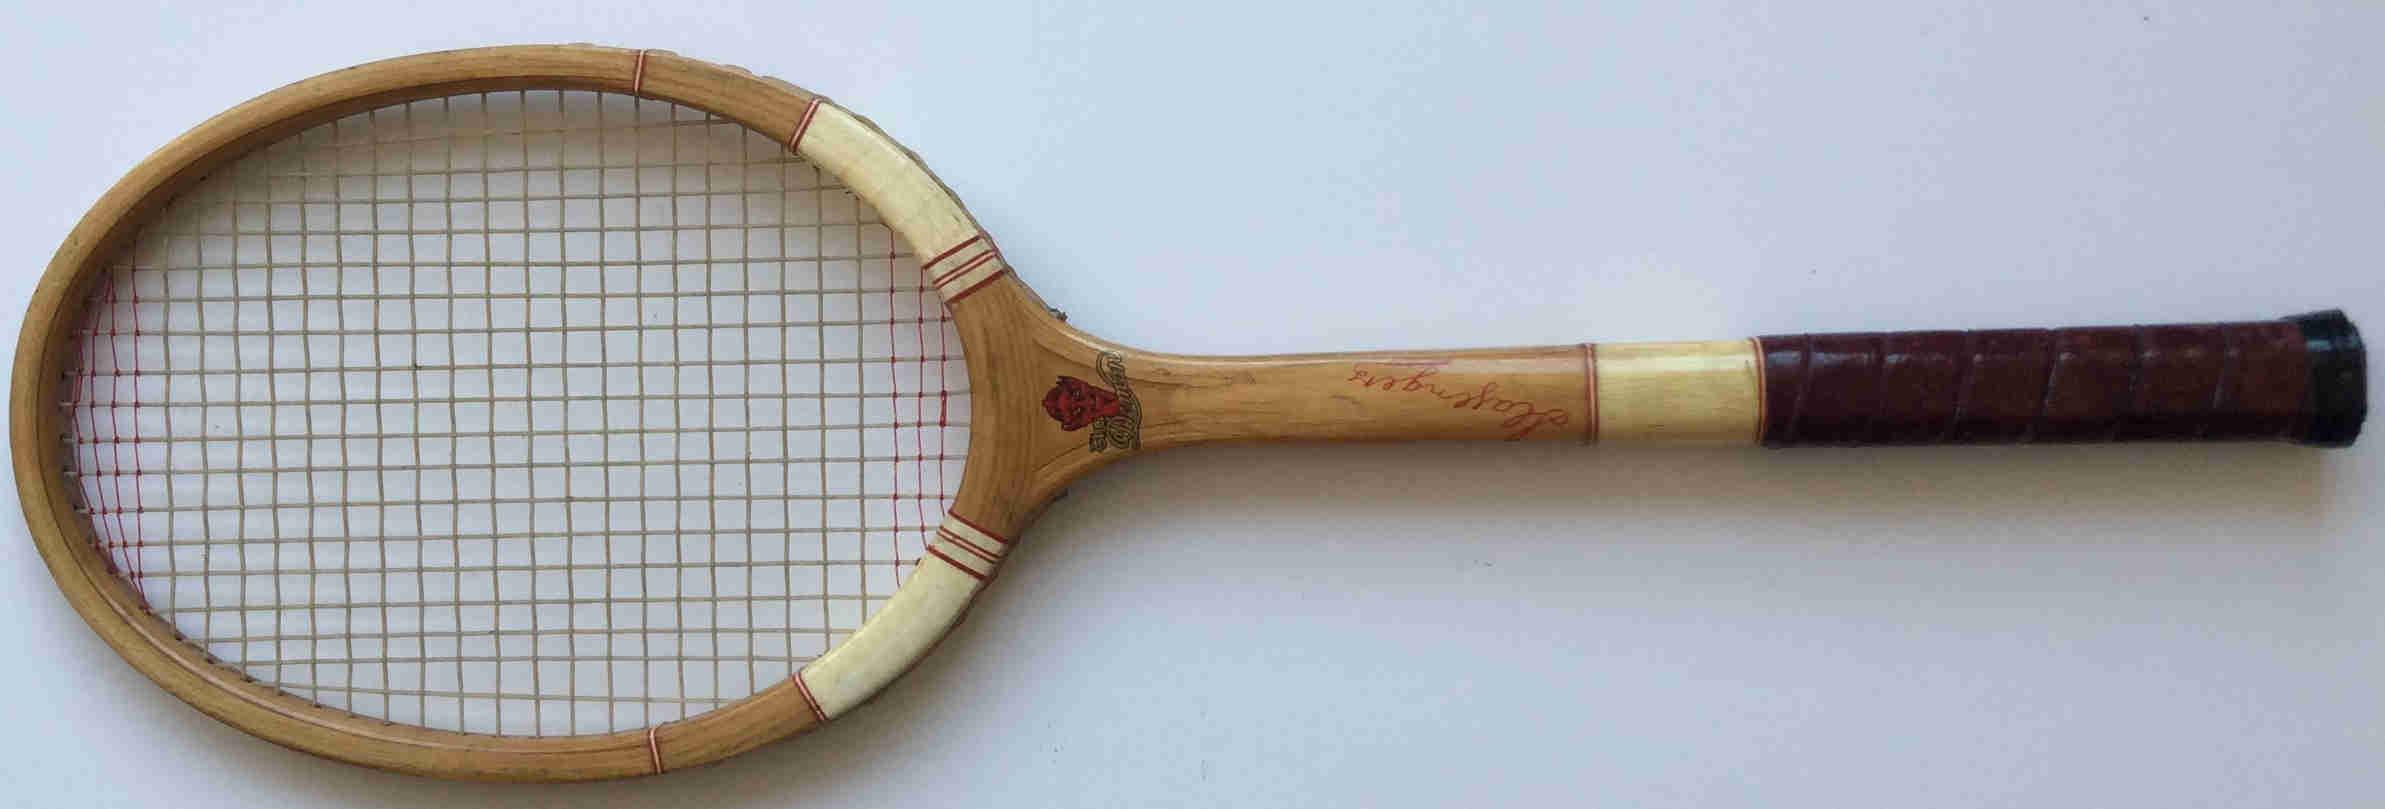 77fe1dfd89 Jim's Tennis - Rackets 1940s - 1970s